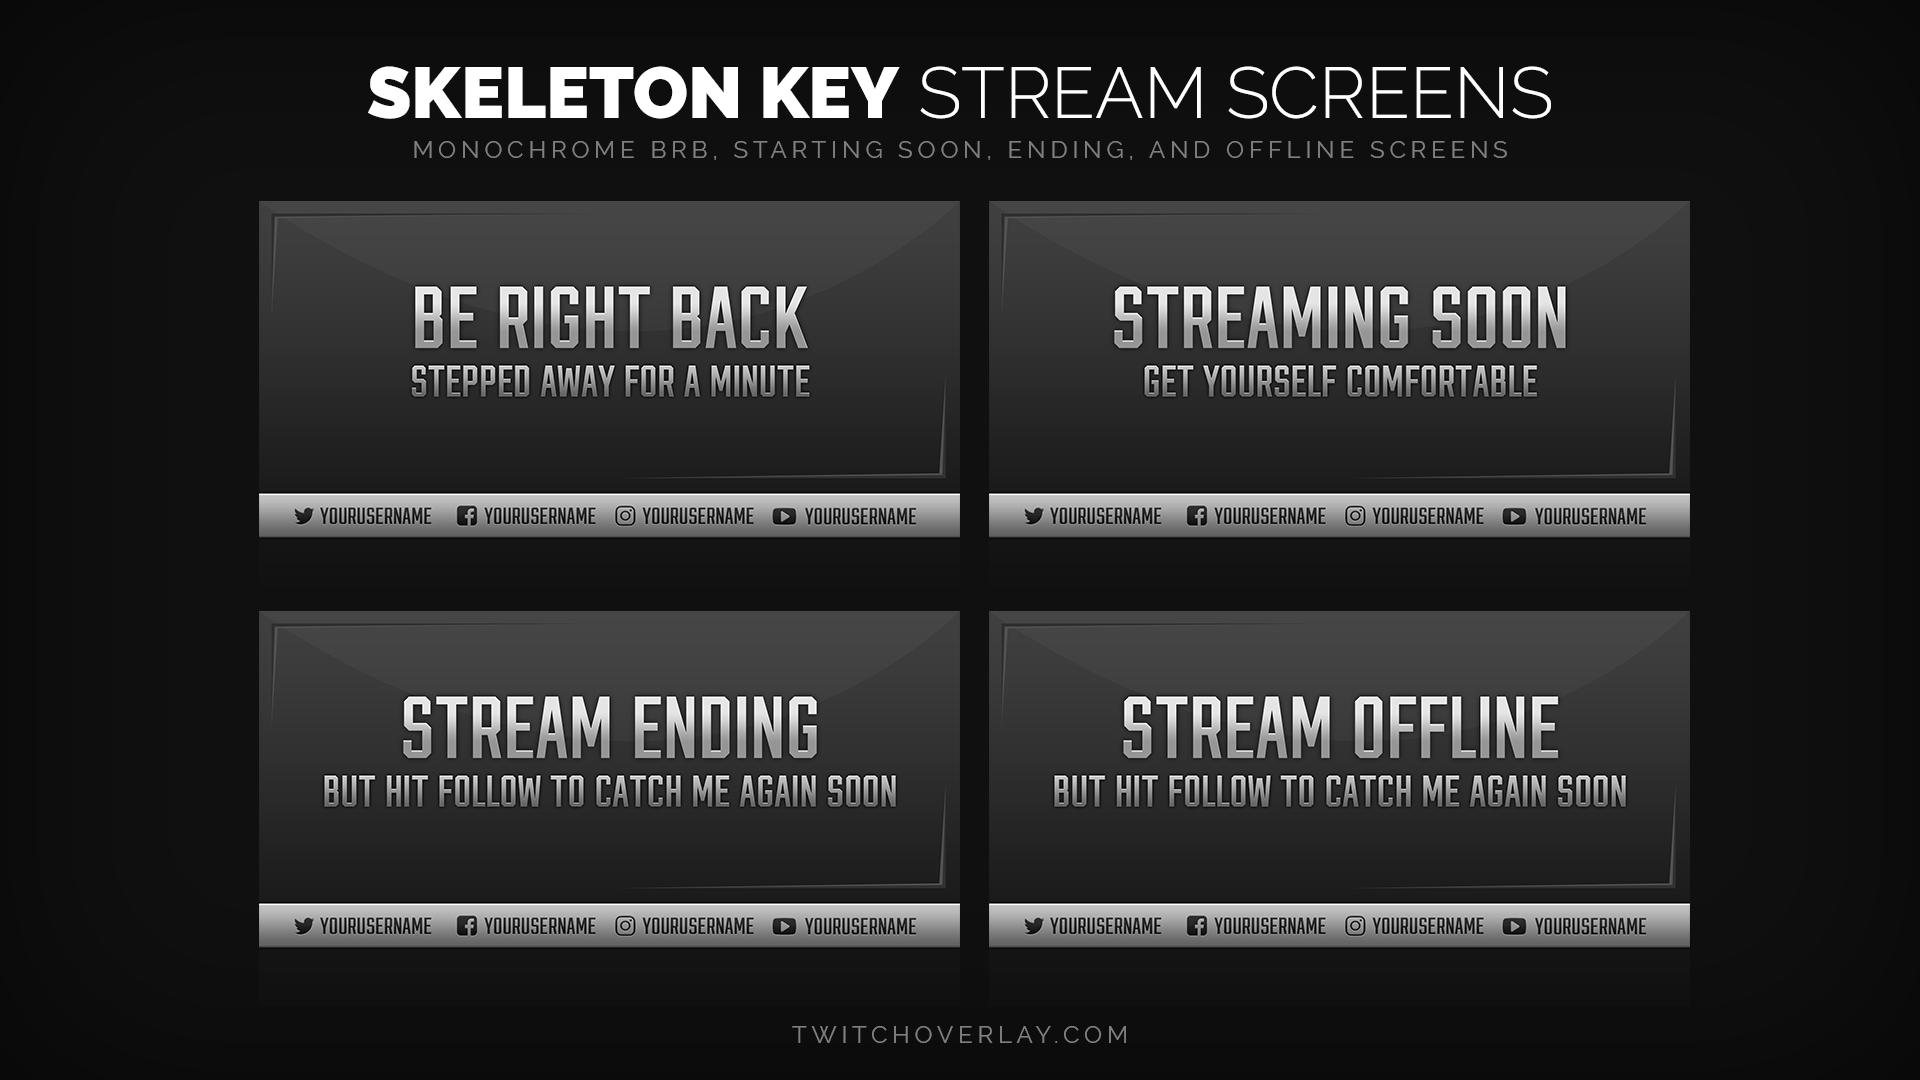 professional stream screens - Twitch Overlay